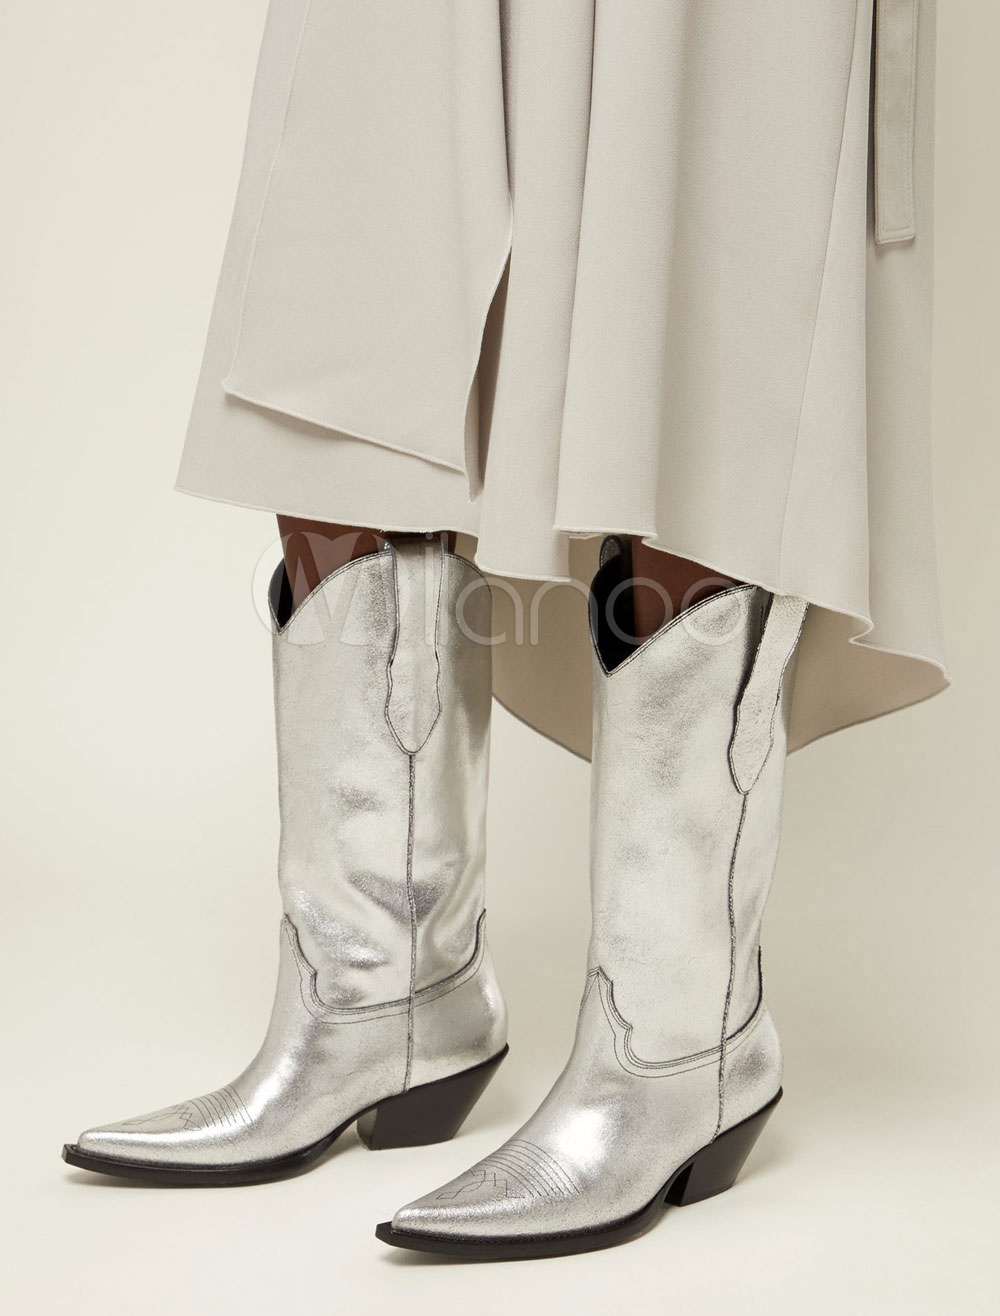 52b5b67155 Botas Vaqueras Para Mujer - Productos de vida inteligente Boda Moda Mujer  Moda Hombre Zapatos Belleza Bisutería   Relojes DISFRACES Eléctronico -  Milanoo. ...